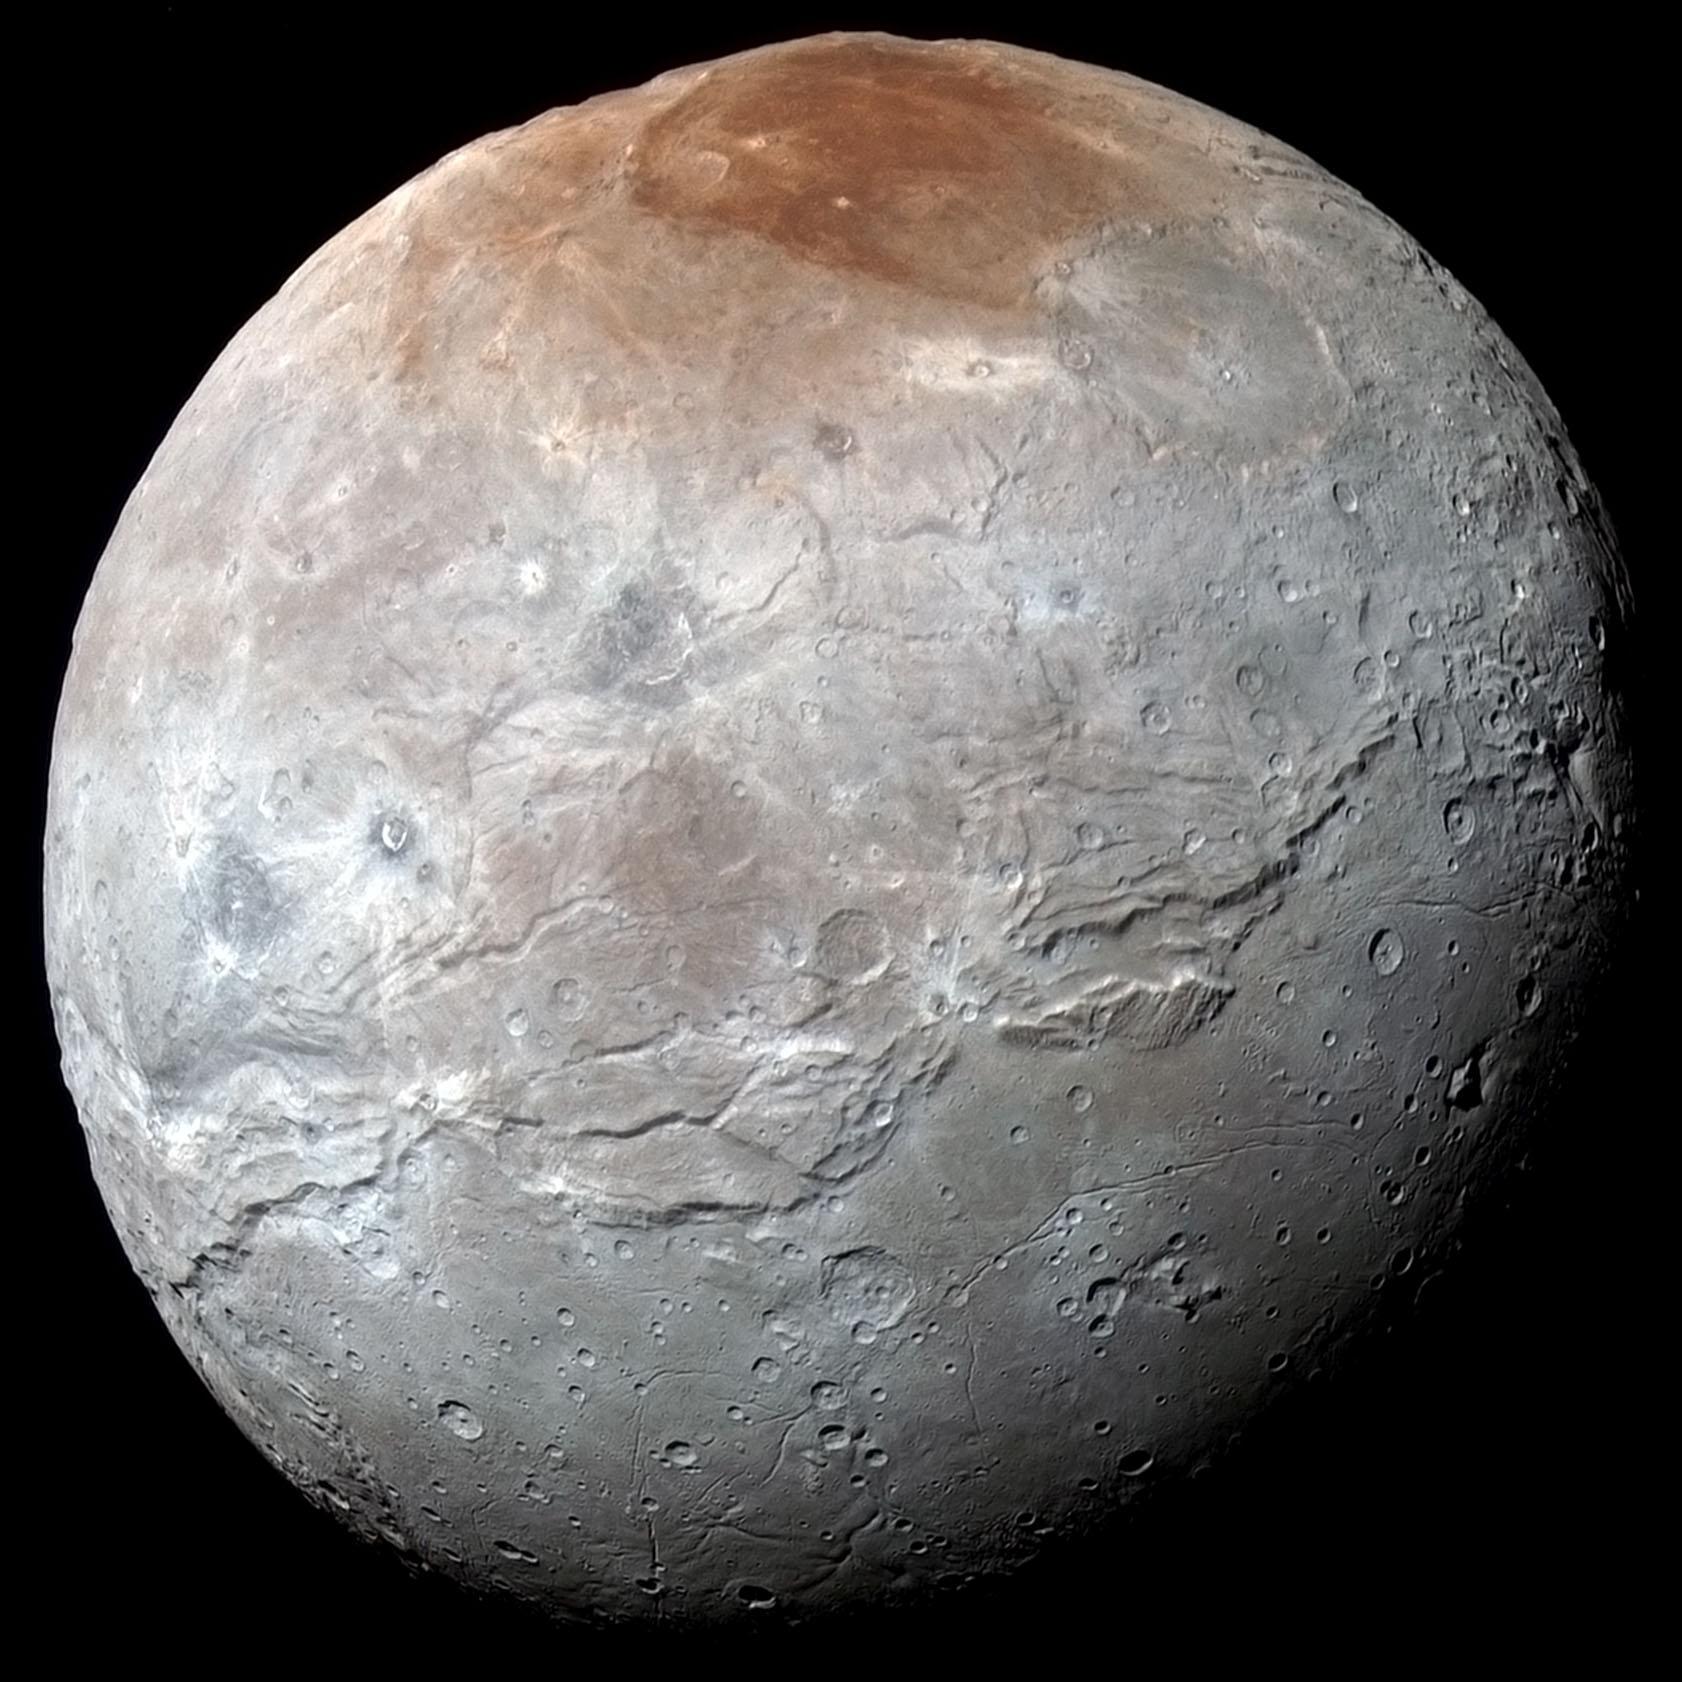 en10-exploring-the-solar-system_04